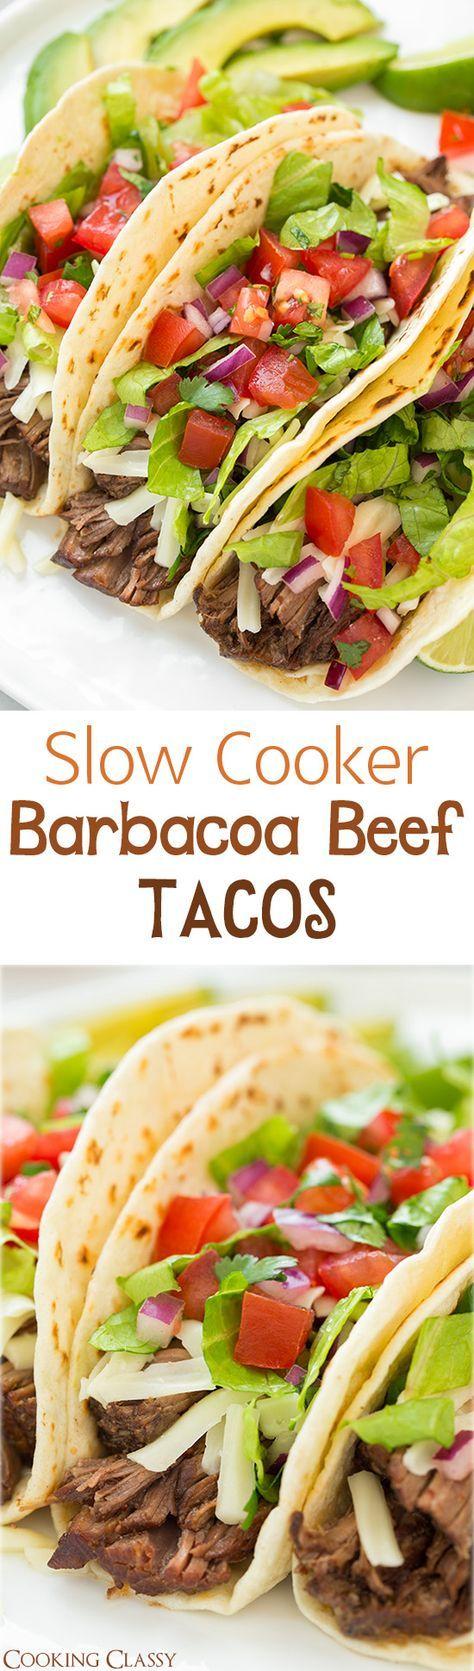 Slow Cooker Barbacoa Beef Tacos (Chipotle Copycat ...